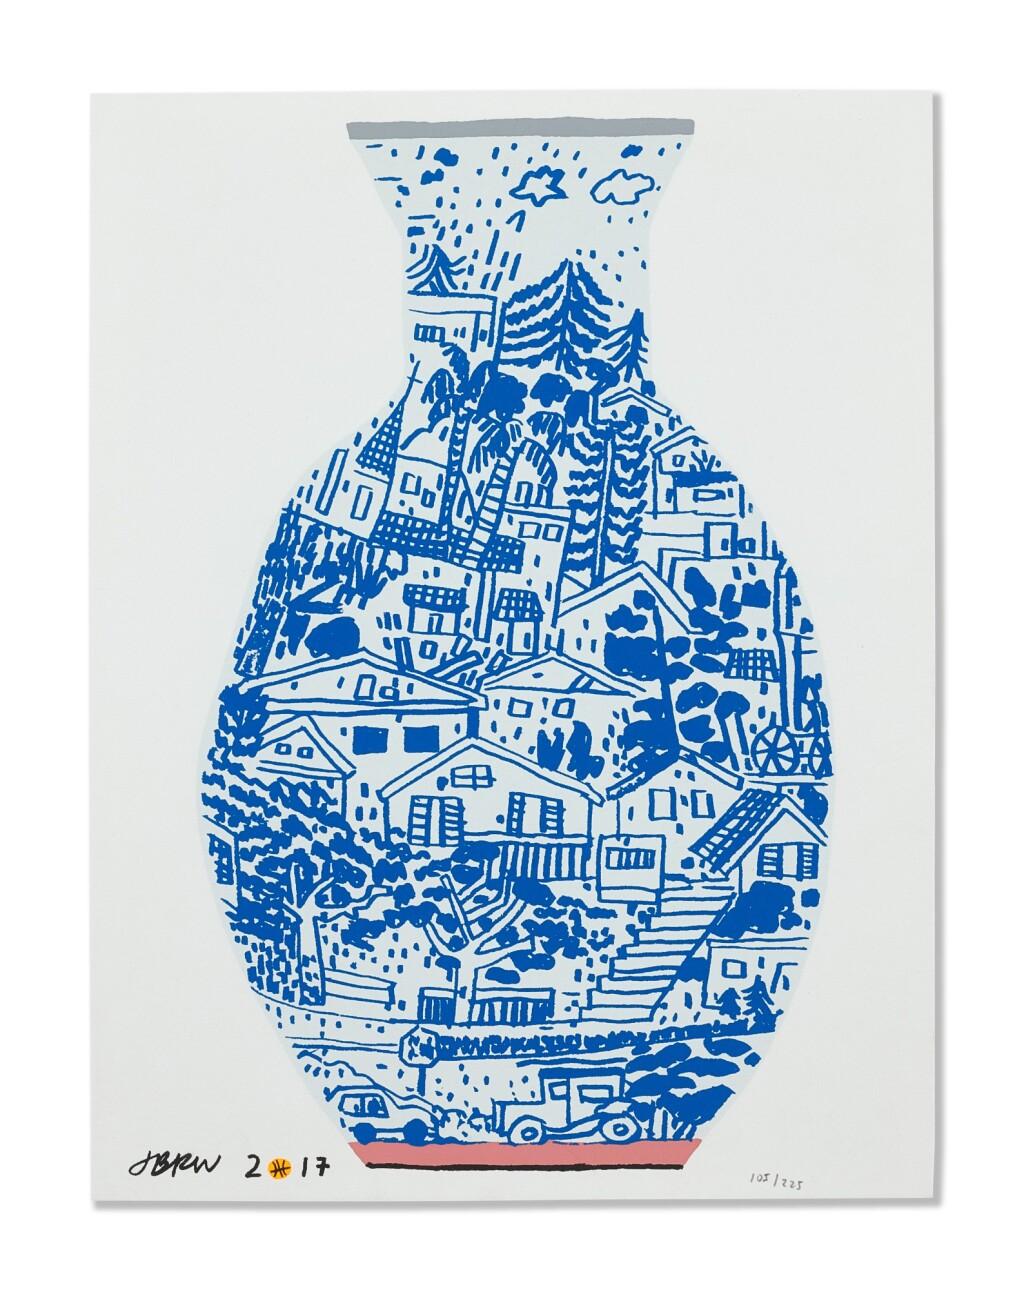 JONAS WOOD 喬納斯・伍德 | BLUE FRIMKESS LANDSCAPE POT 藍色弗里克斯風景壺